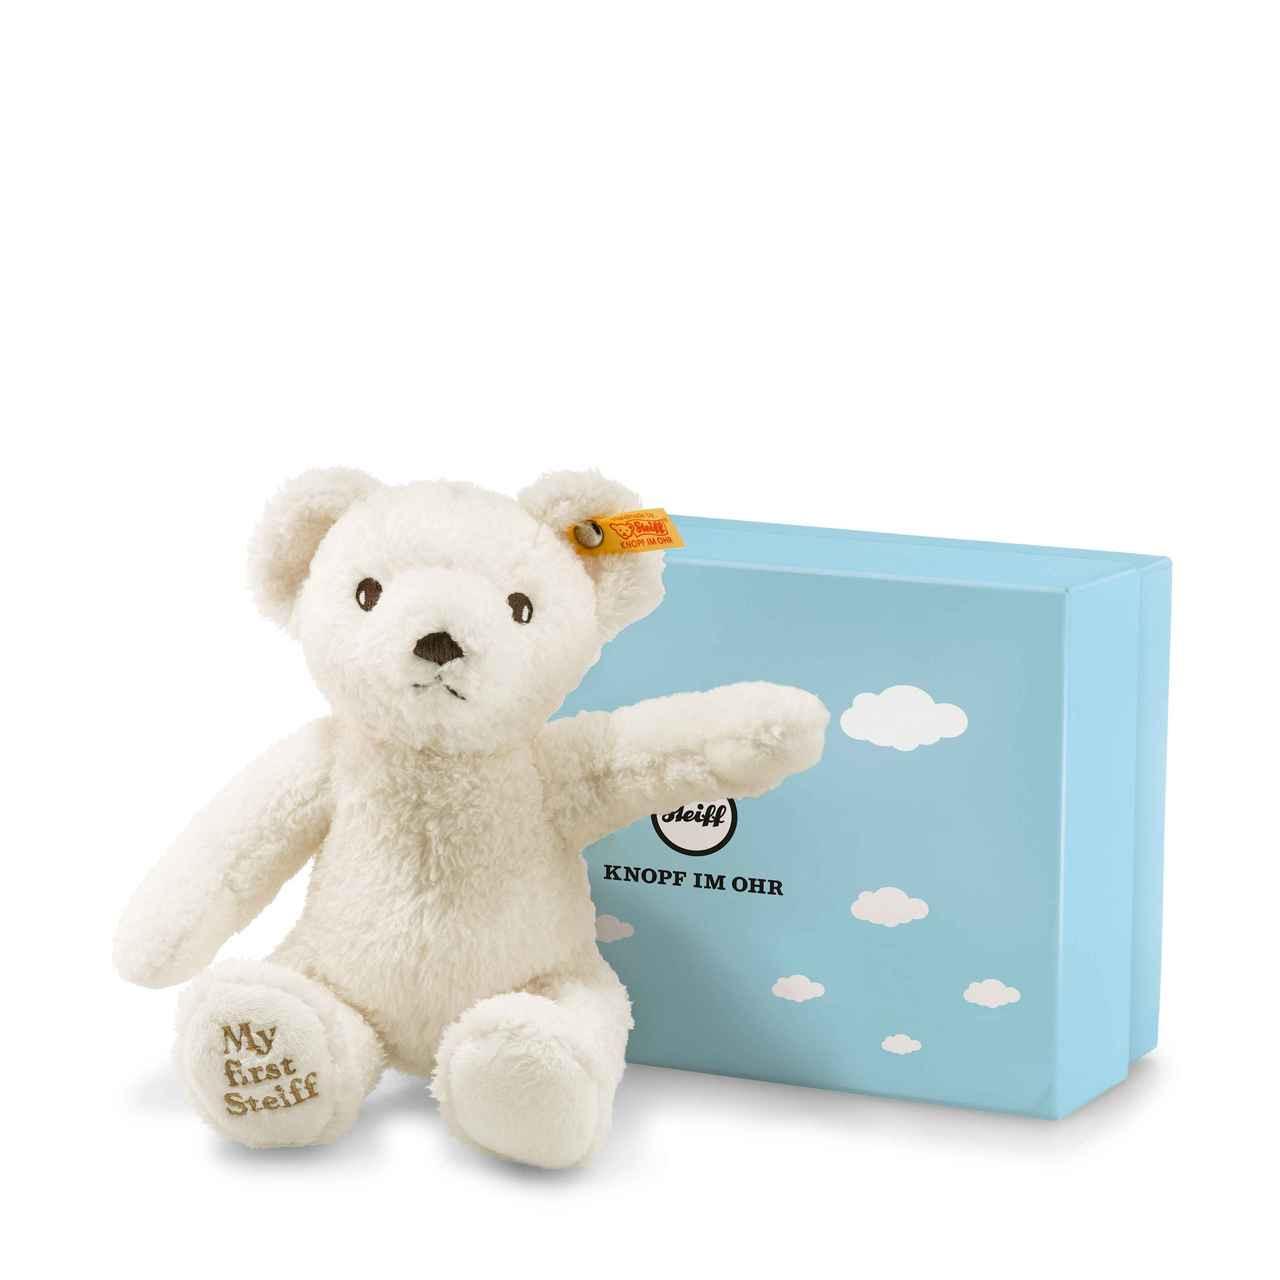 77dae003147 My First Steiff Teddy Bear Cream in Gift Box